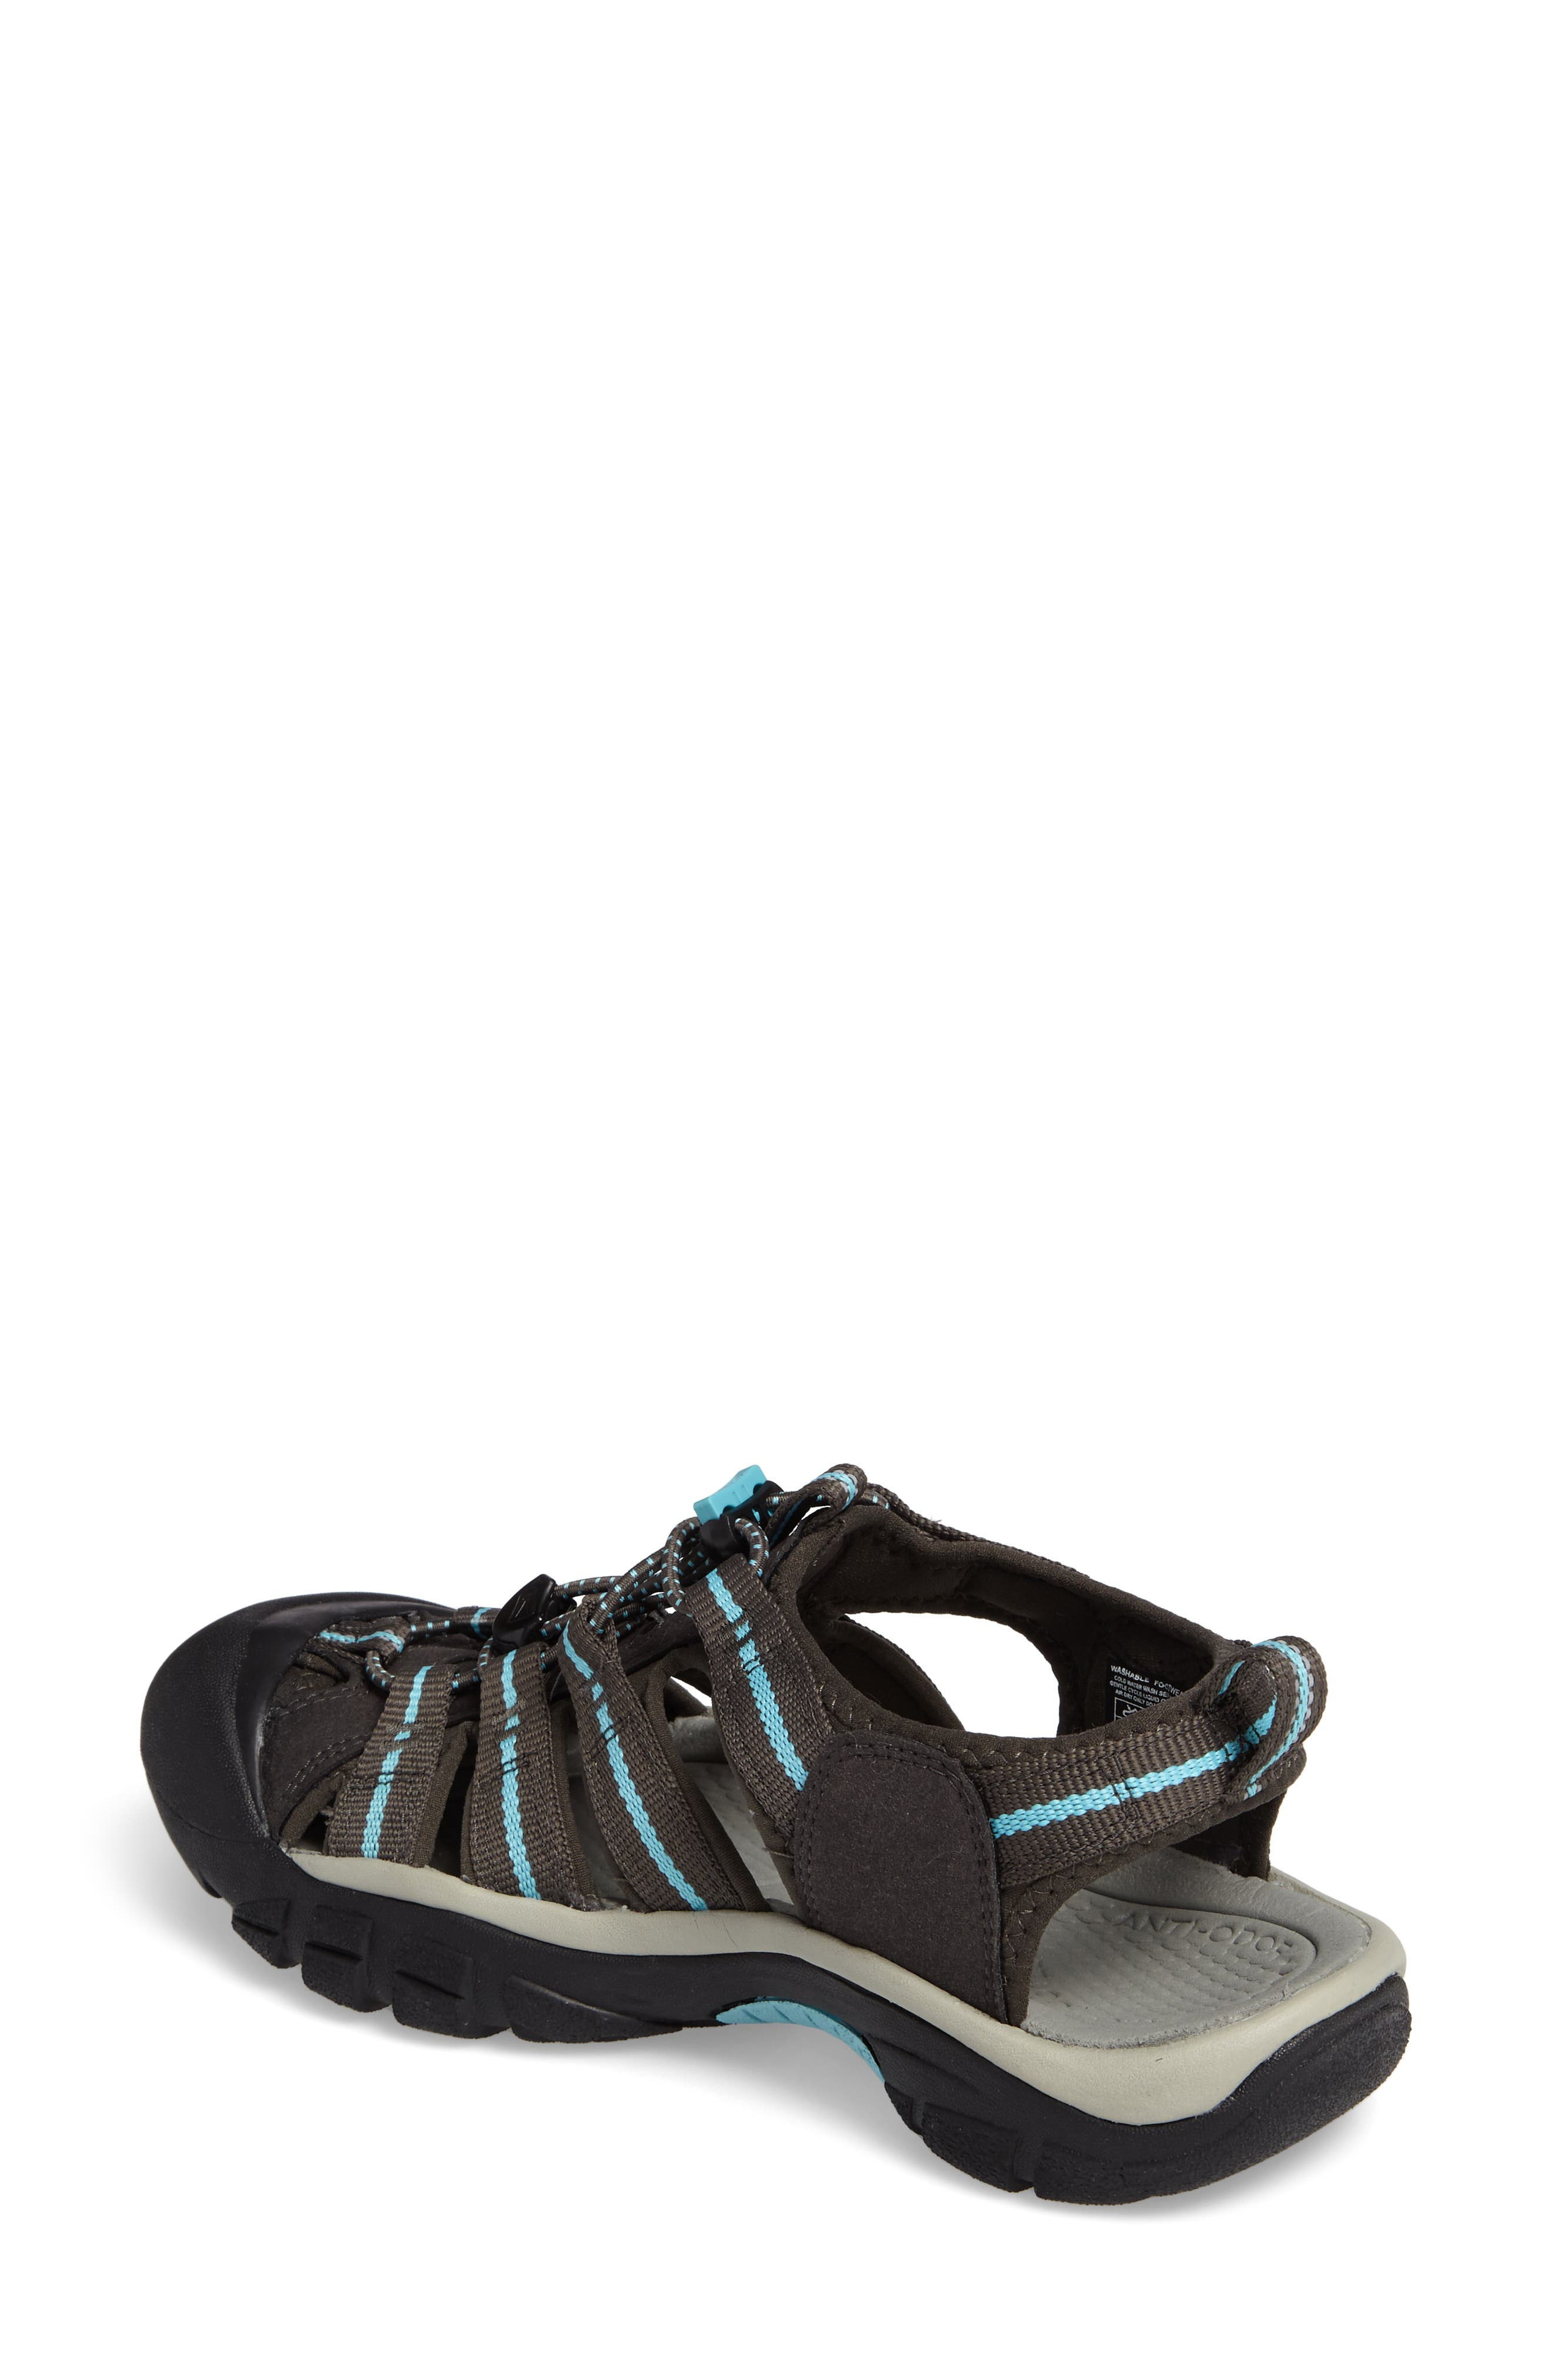 'Newport H2' Sandal,                             Alternate thumbnail 2, color,                             021